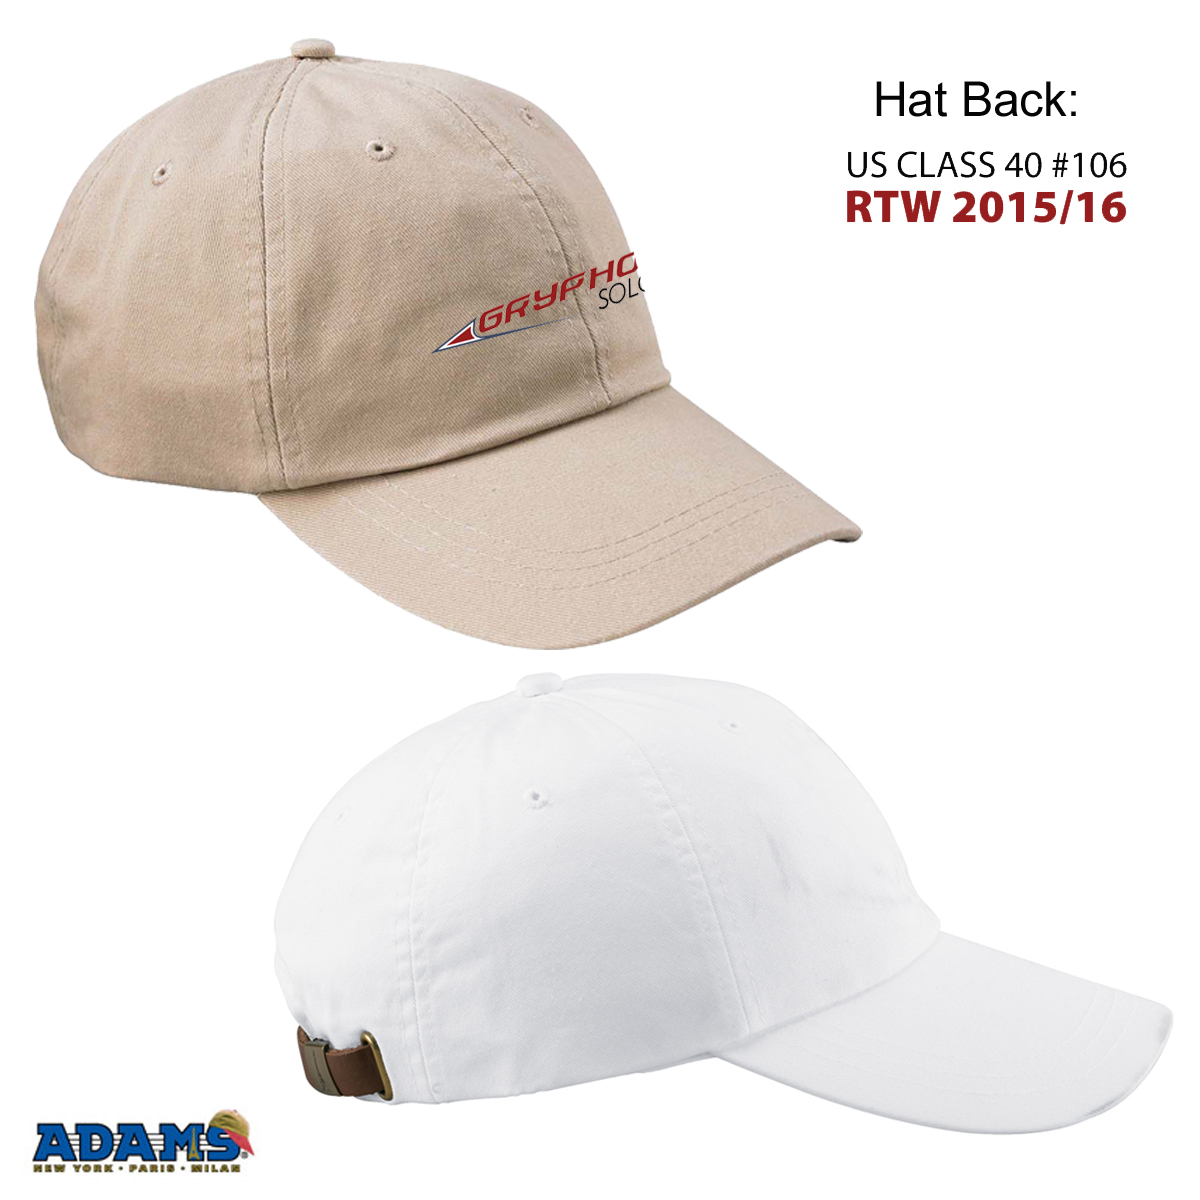 GRYPHON SOLO 2 - ADJUSTABLE CAP